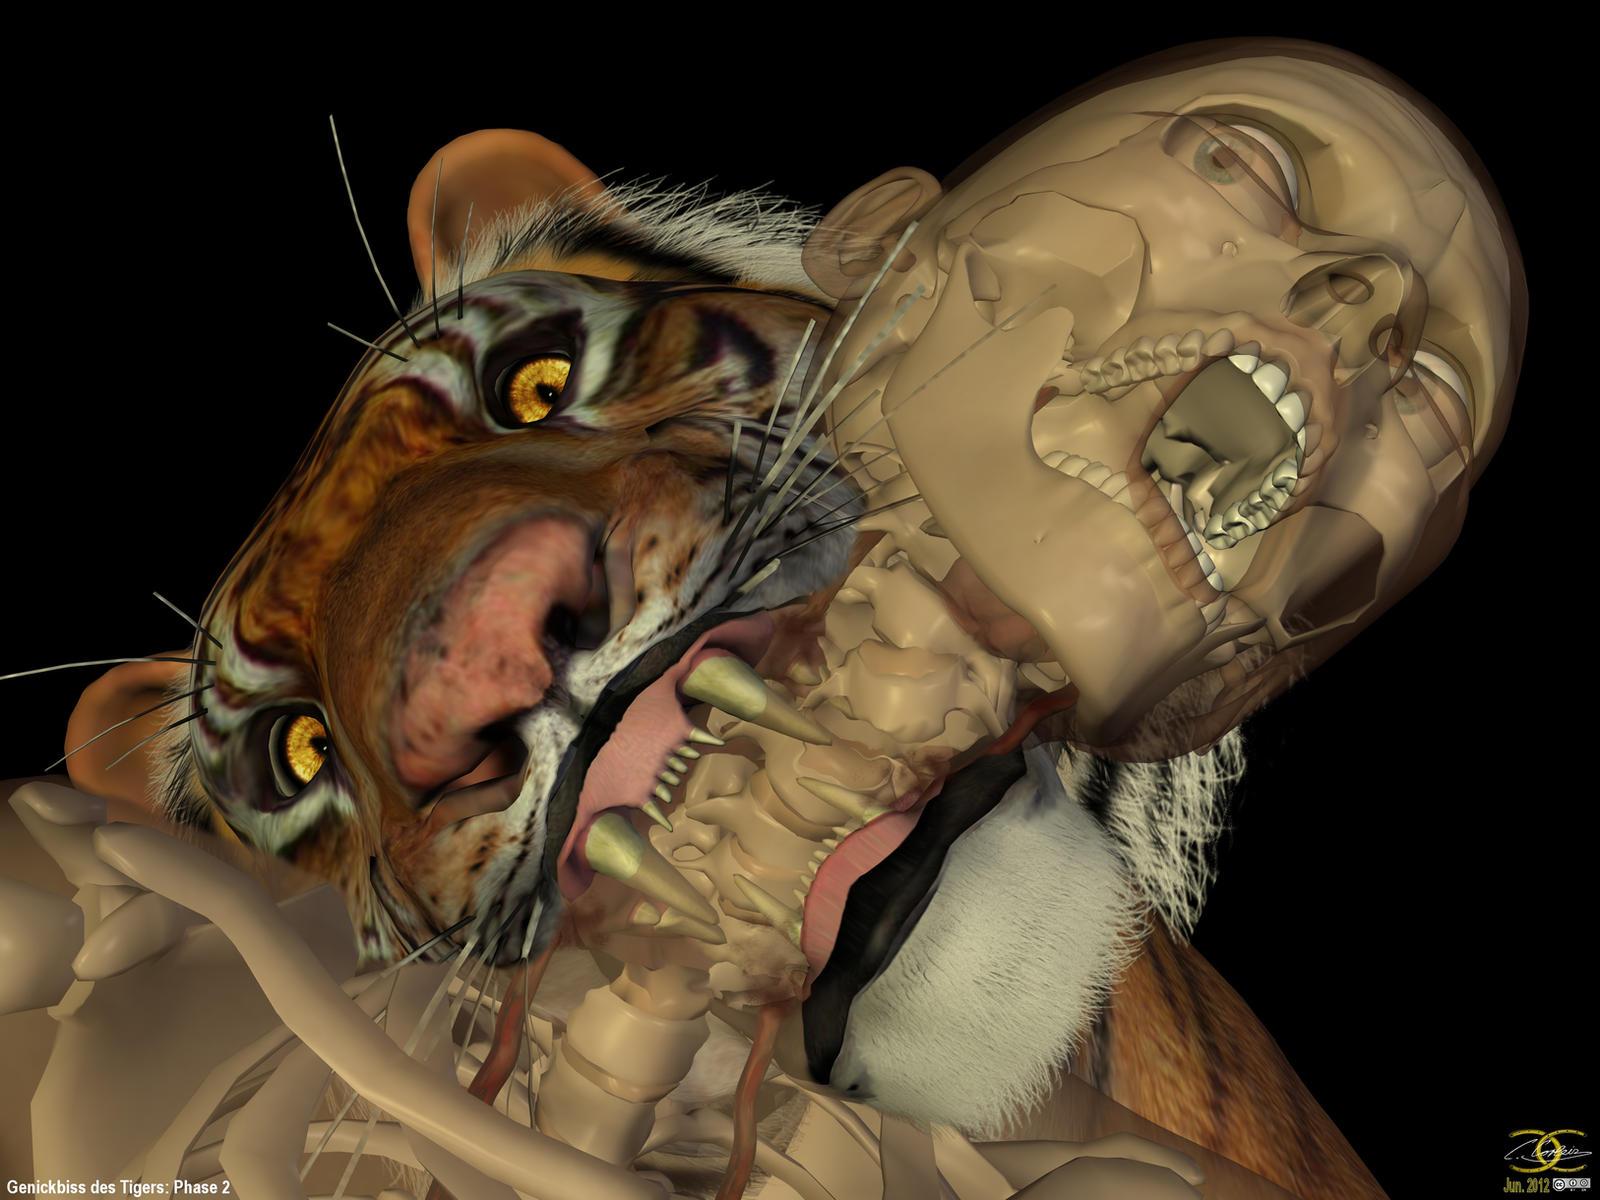 Male Cat Bites Male Human